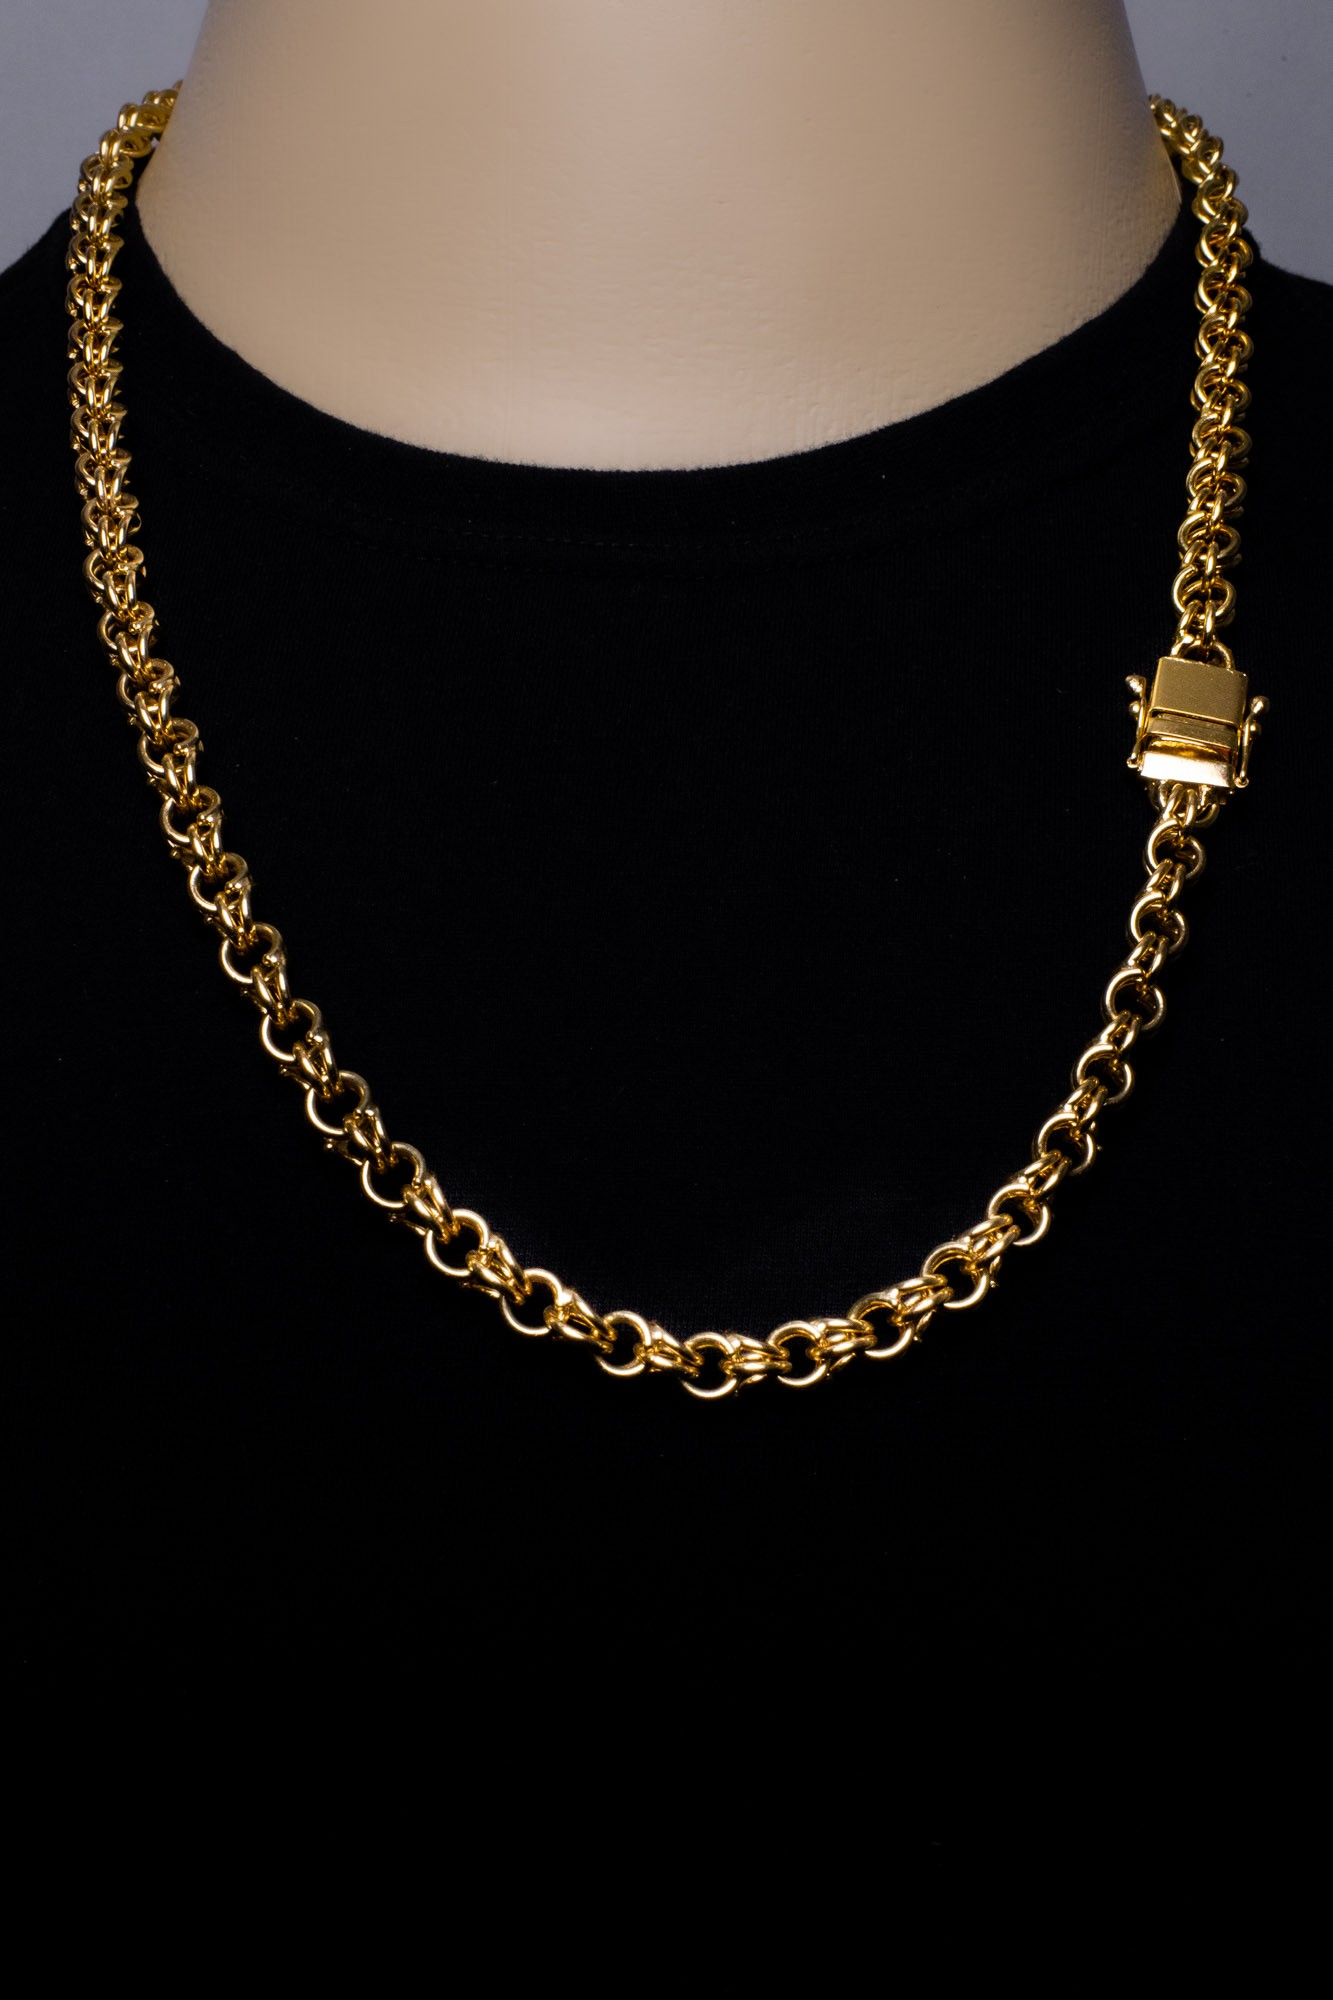 Corrente Friso duplo -  9 milímetros - 70 Centímetros - fecho Gaveta   - Banhado a ouro 18 k